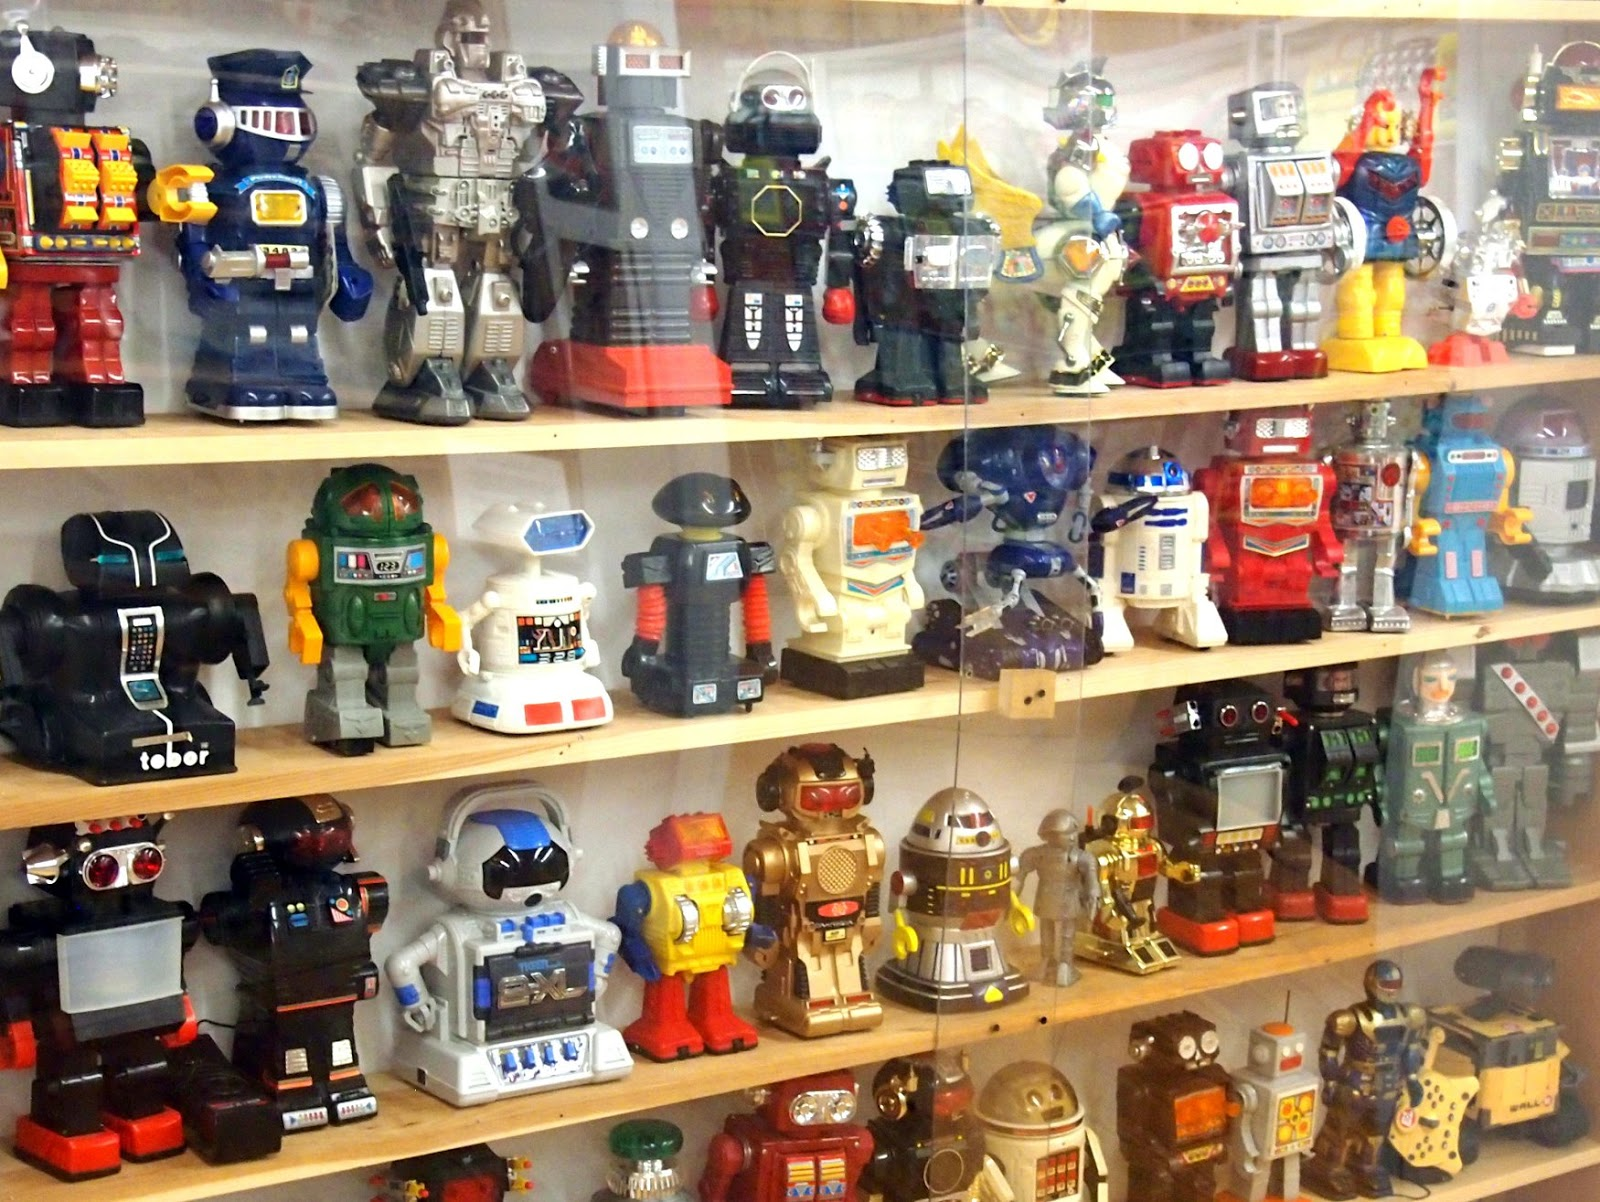 80 Toy Action Figure Shelves - Vermont+Toy+Museum+4__OTIS_Wonderful 80 Toy Action Figure Shelves - Vermont+Toy+Museum+4__OTIS  HD_335488.jpg